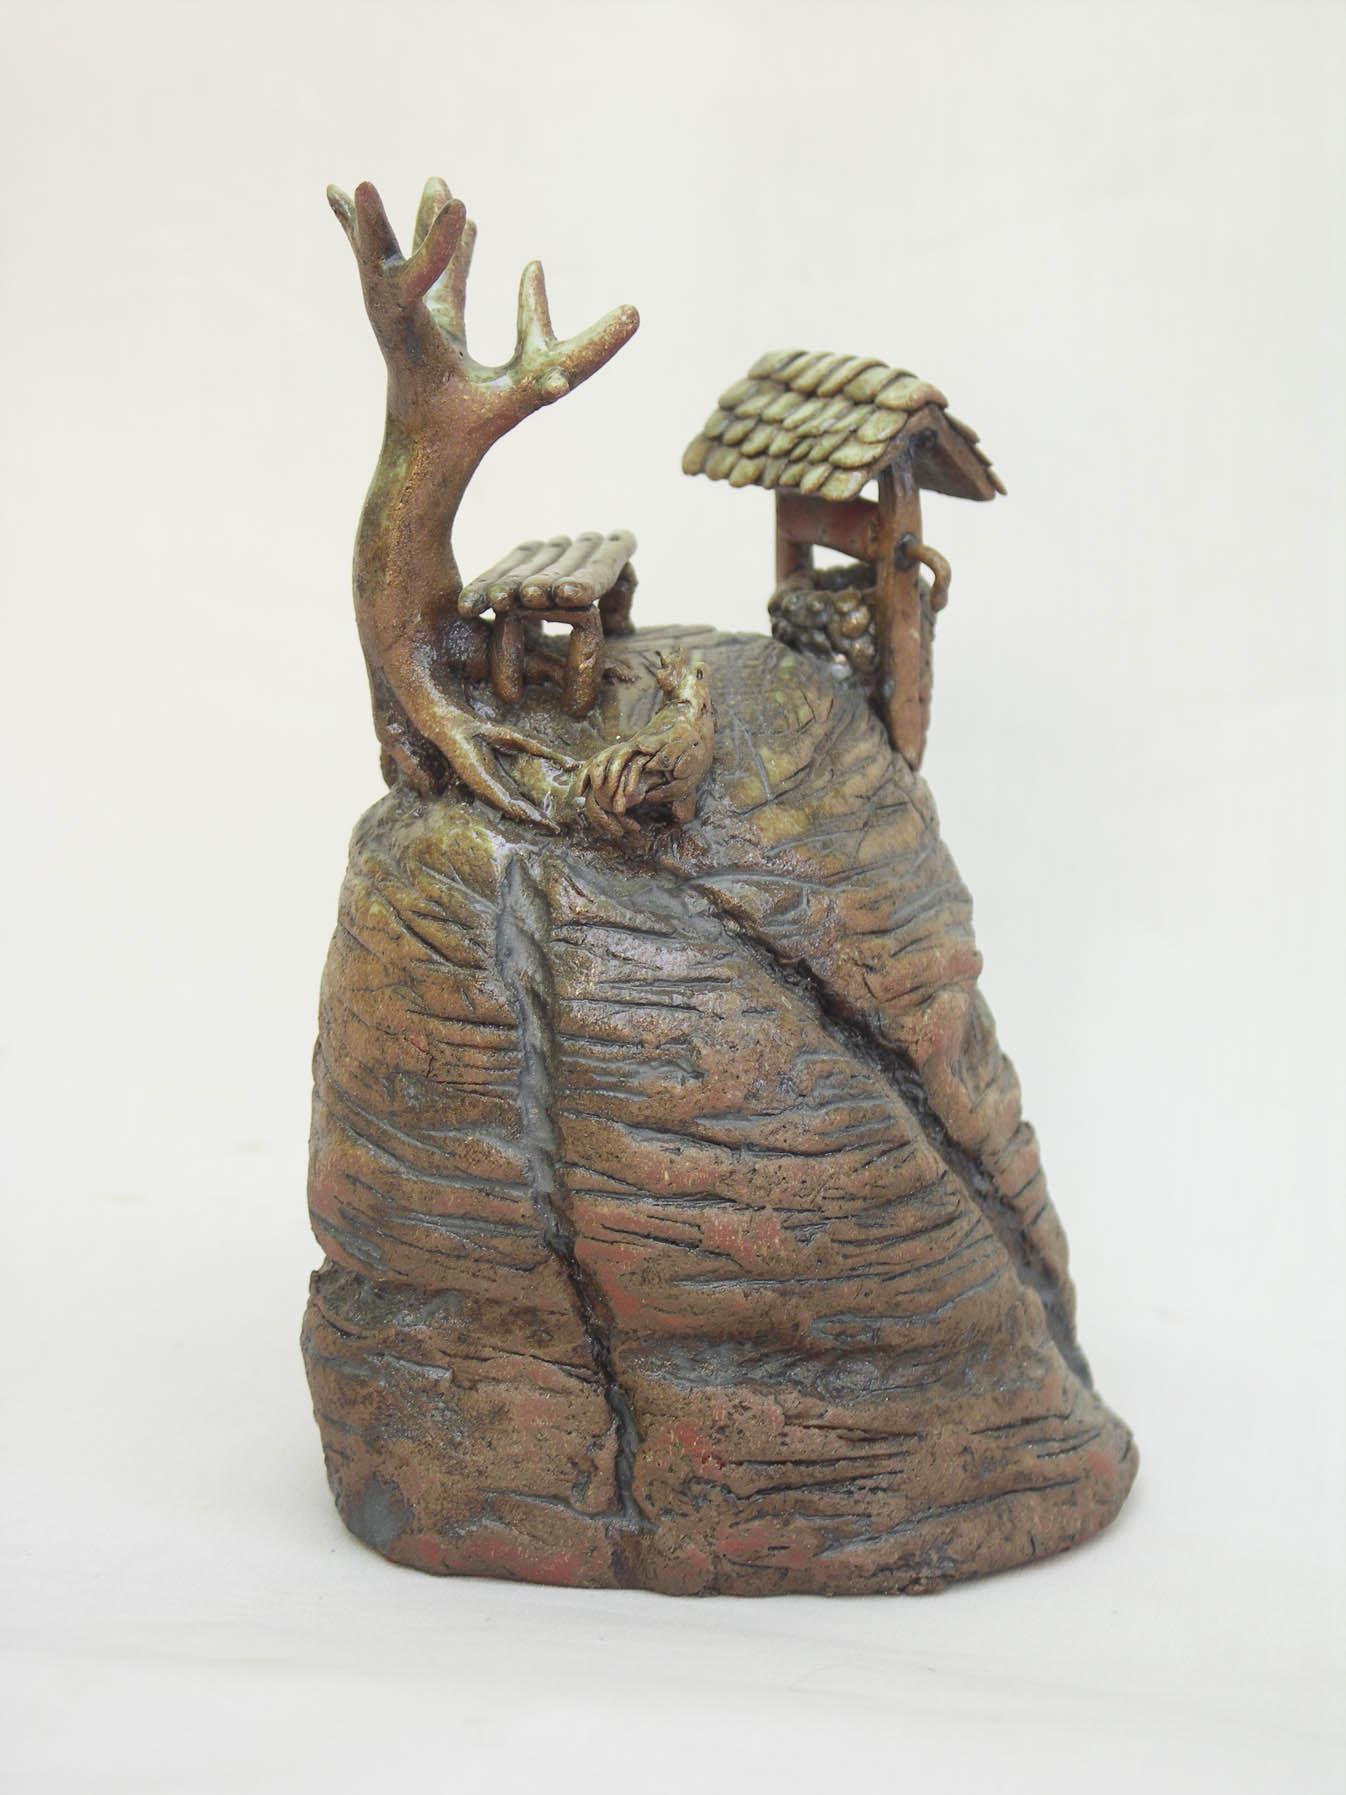 troyan-museum-ralica-yovkova-12